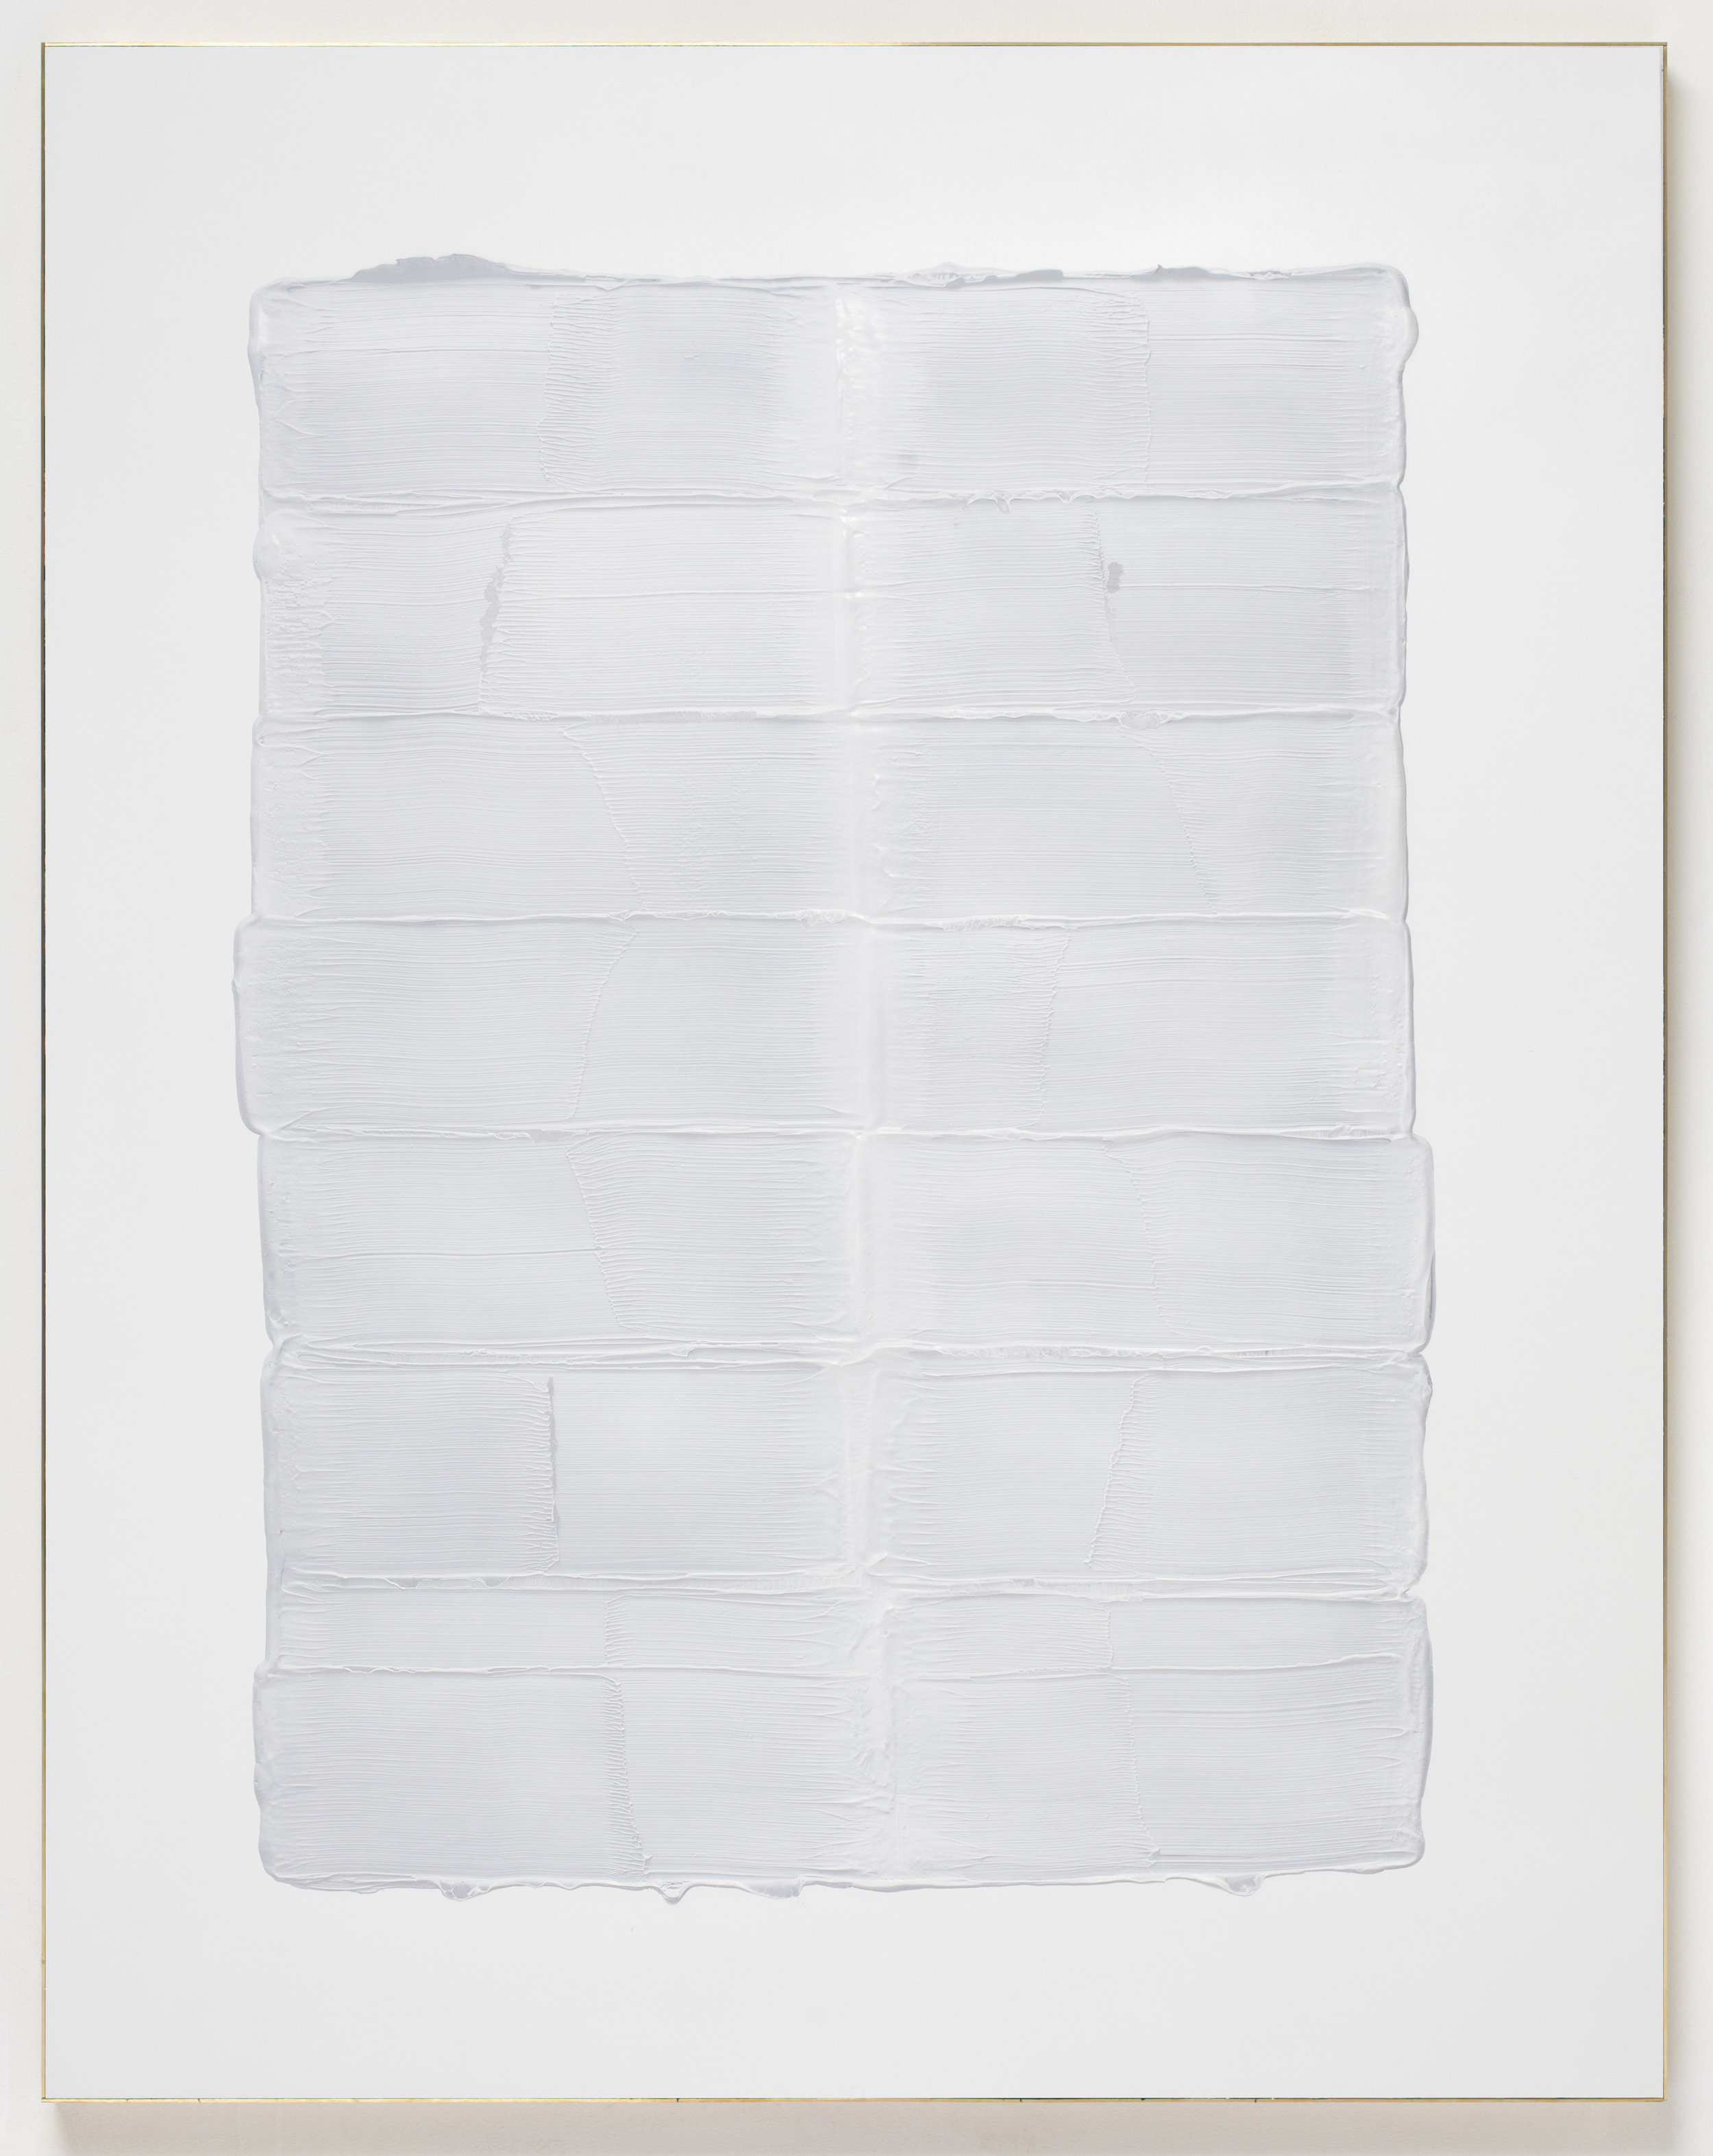 Joe Reihsen, We Are Breathing, 2015 acrylic on birch panel, brass frame 153 x 120 x 4 cm - 60 1/4 x 47 1/4 x 1 5/8 inches (framed)